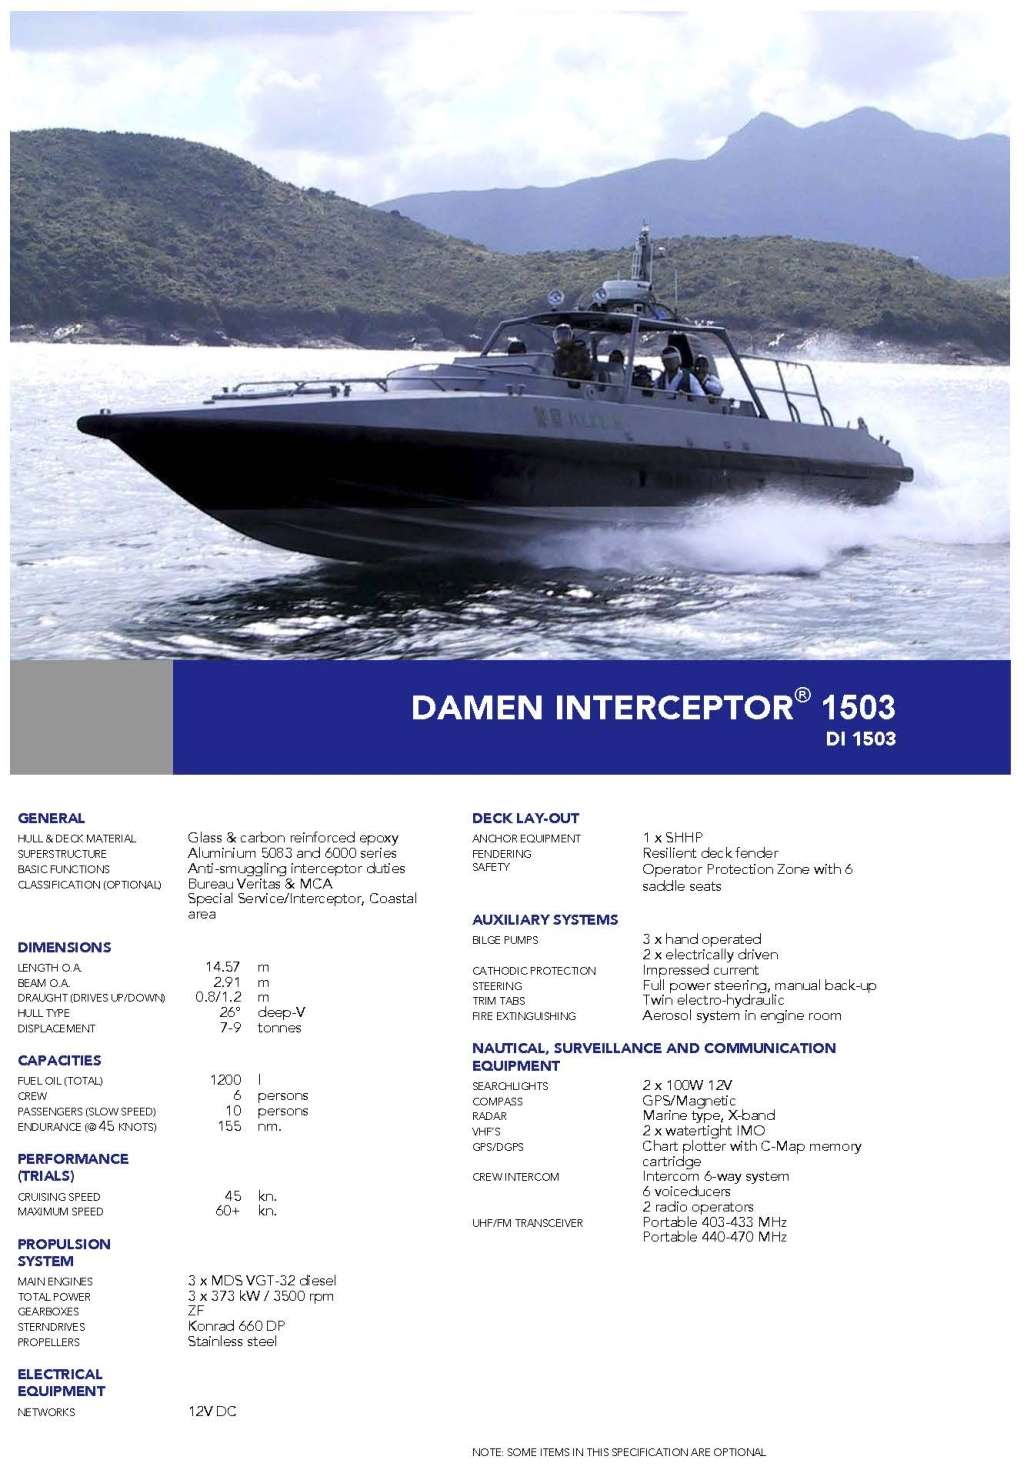 5 Interceptor 1503 pour la Marine Royale  Clipb210